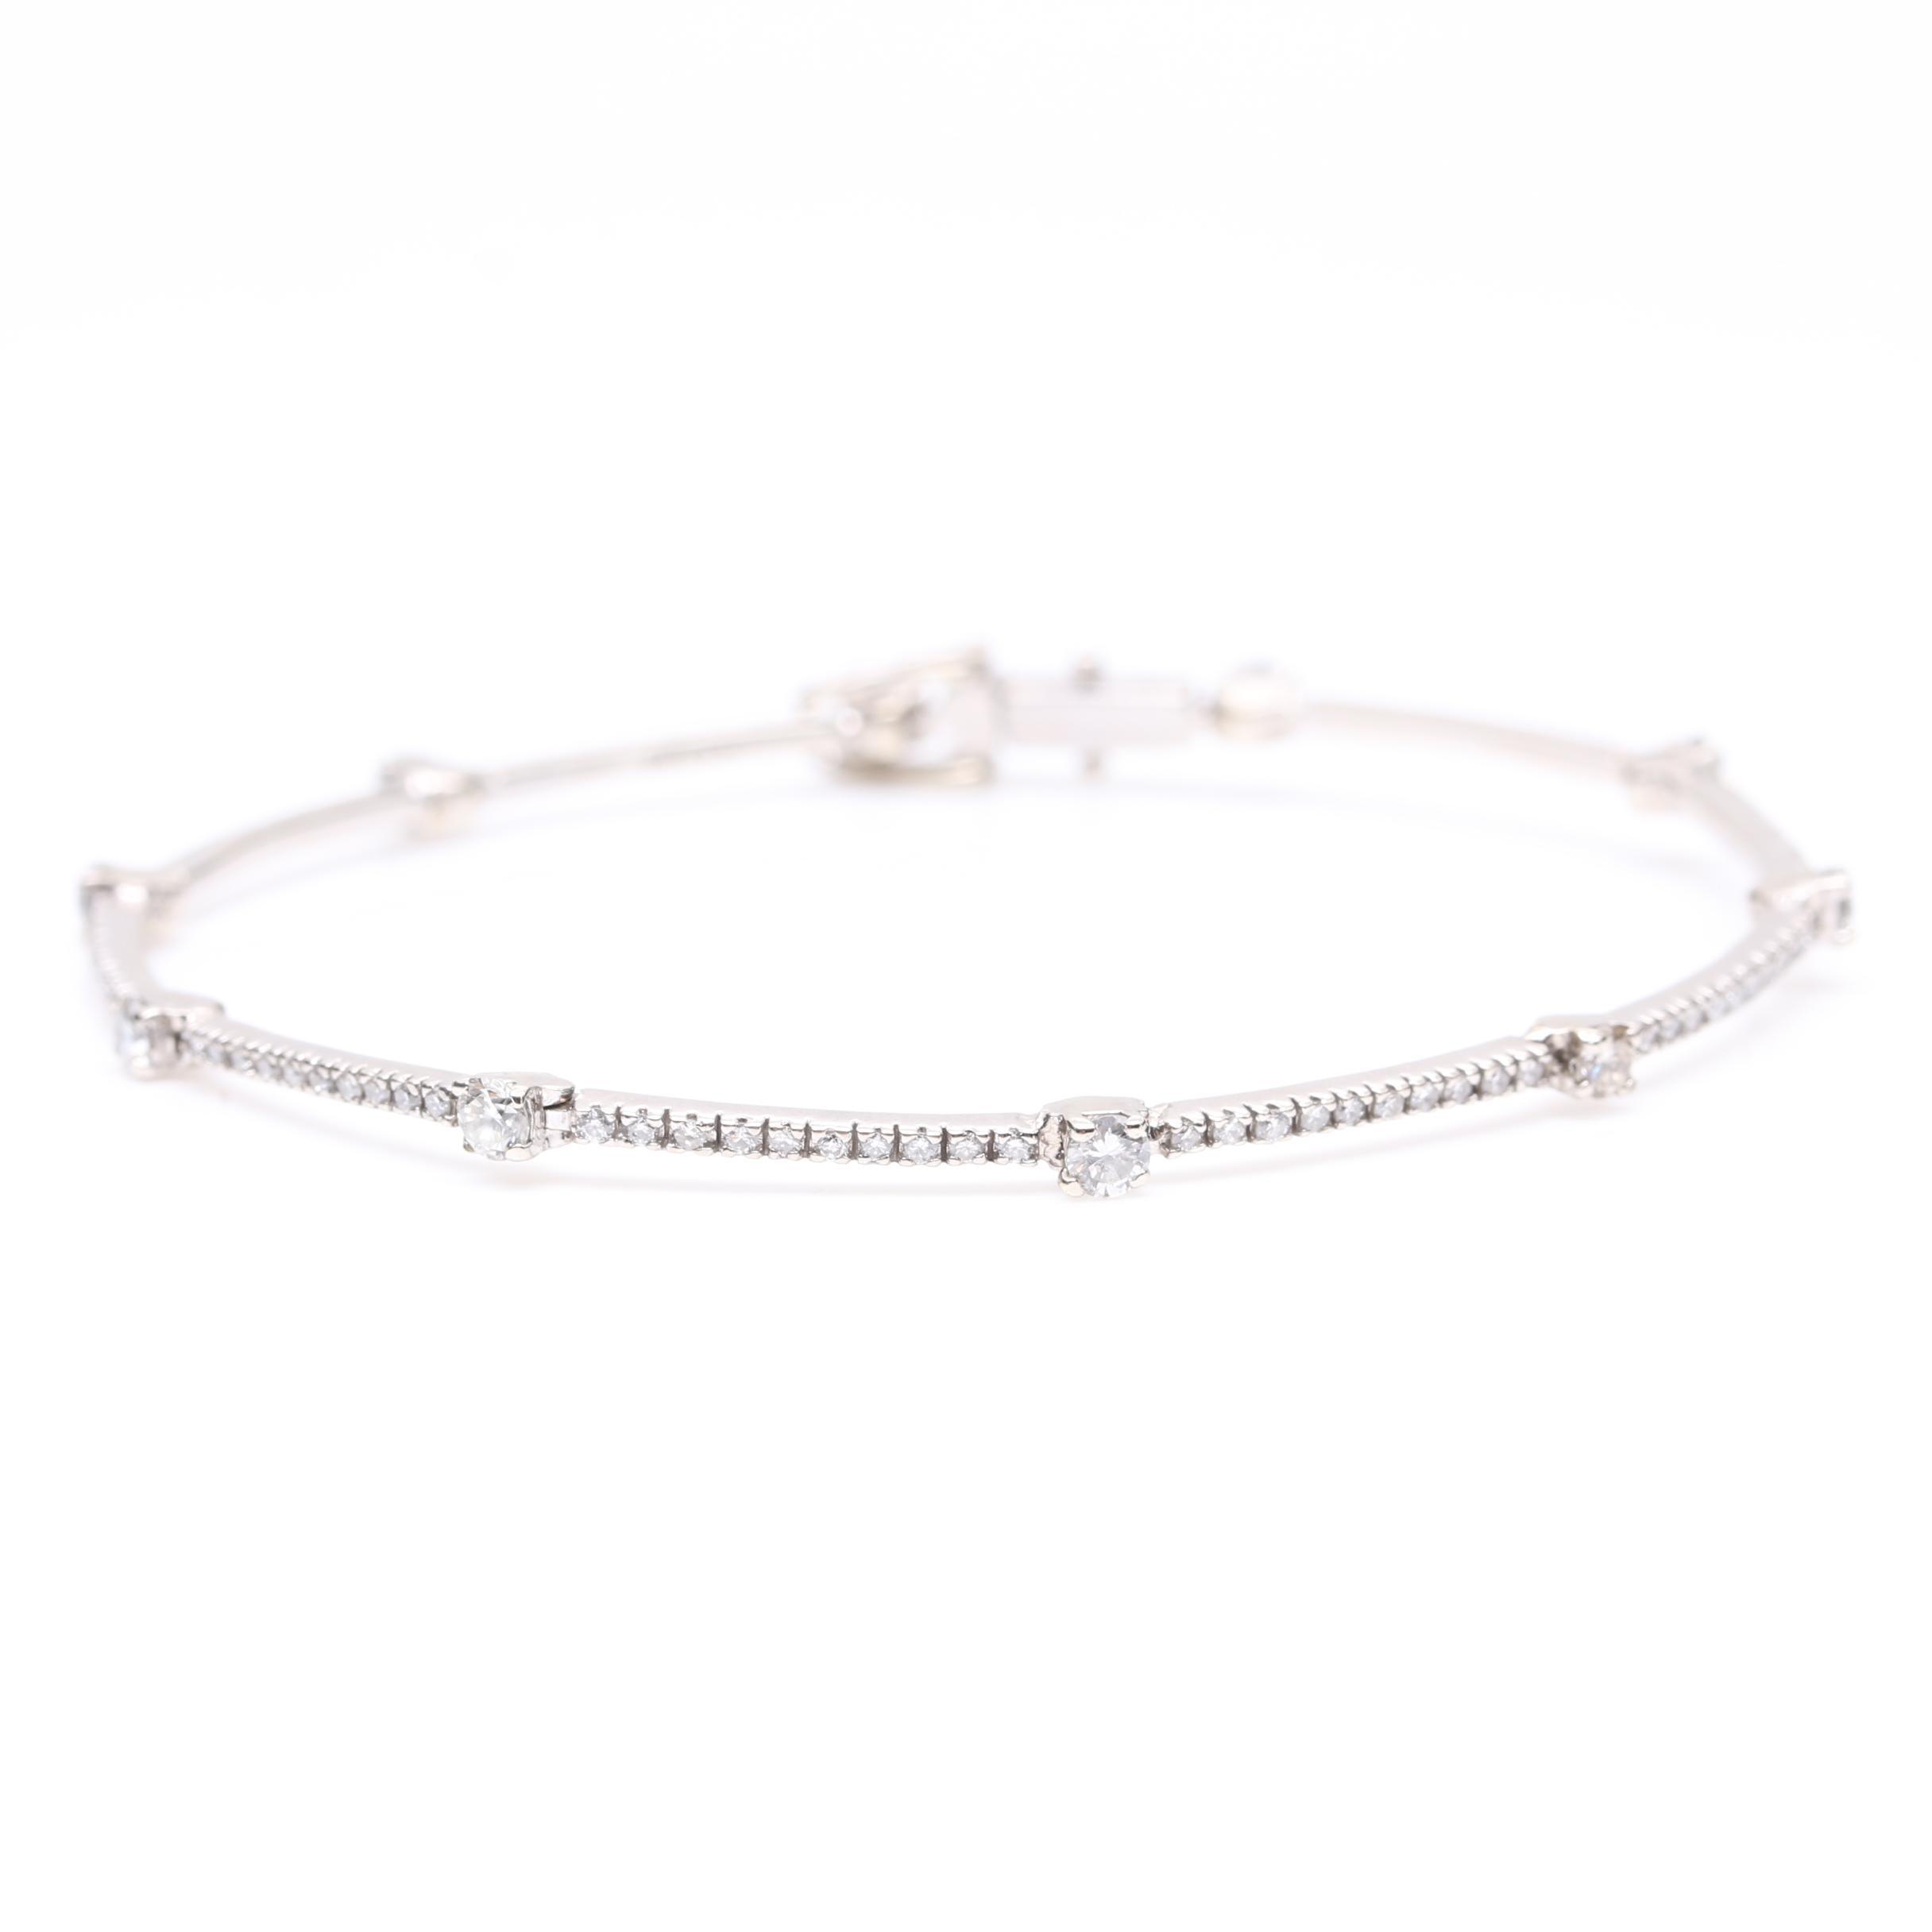 14K White Gold 1.38 CTW Diamond Bangle Bracelet